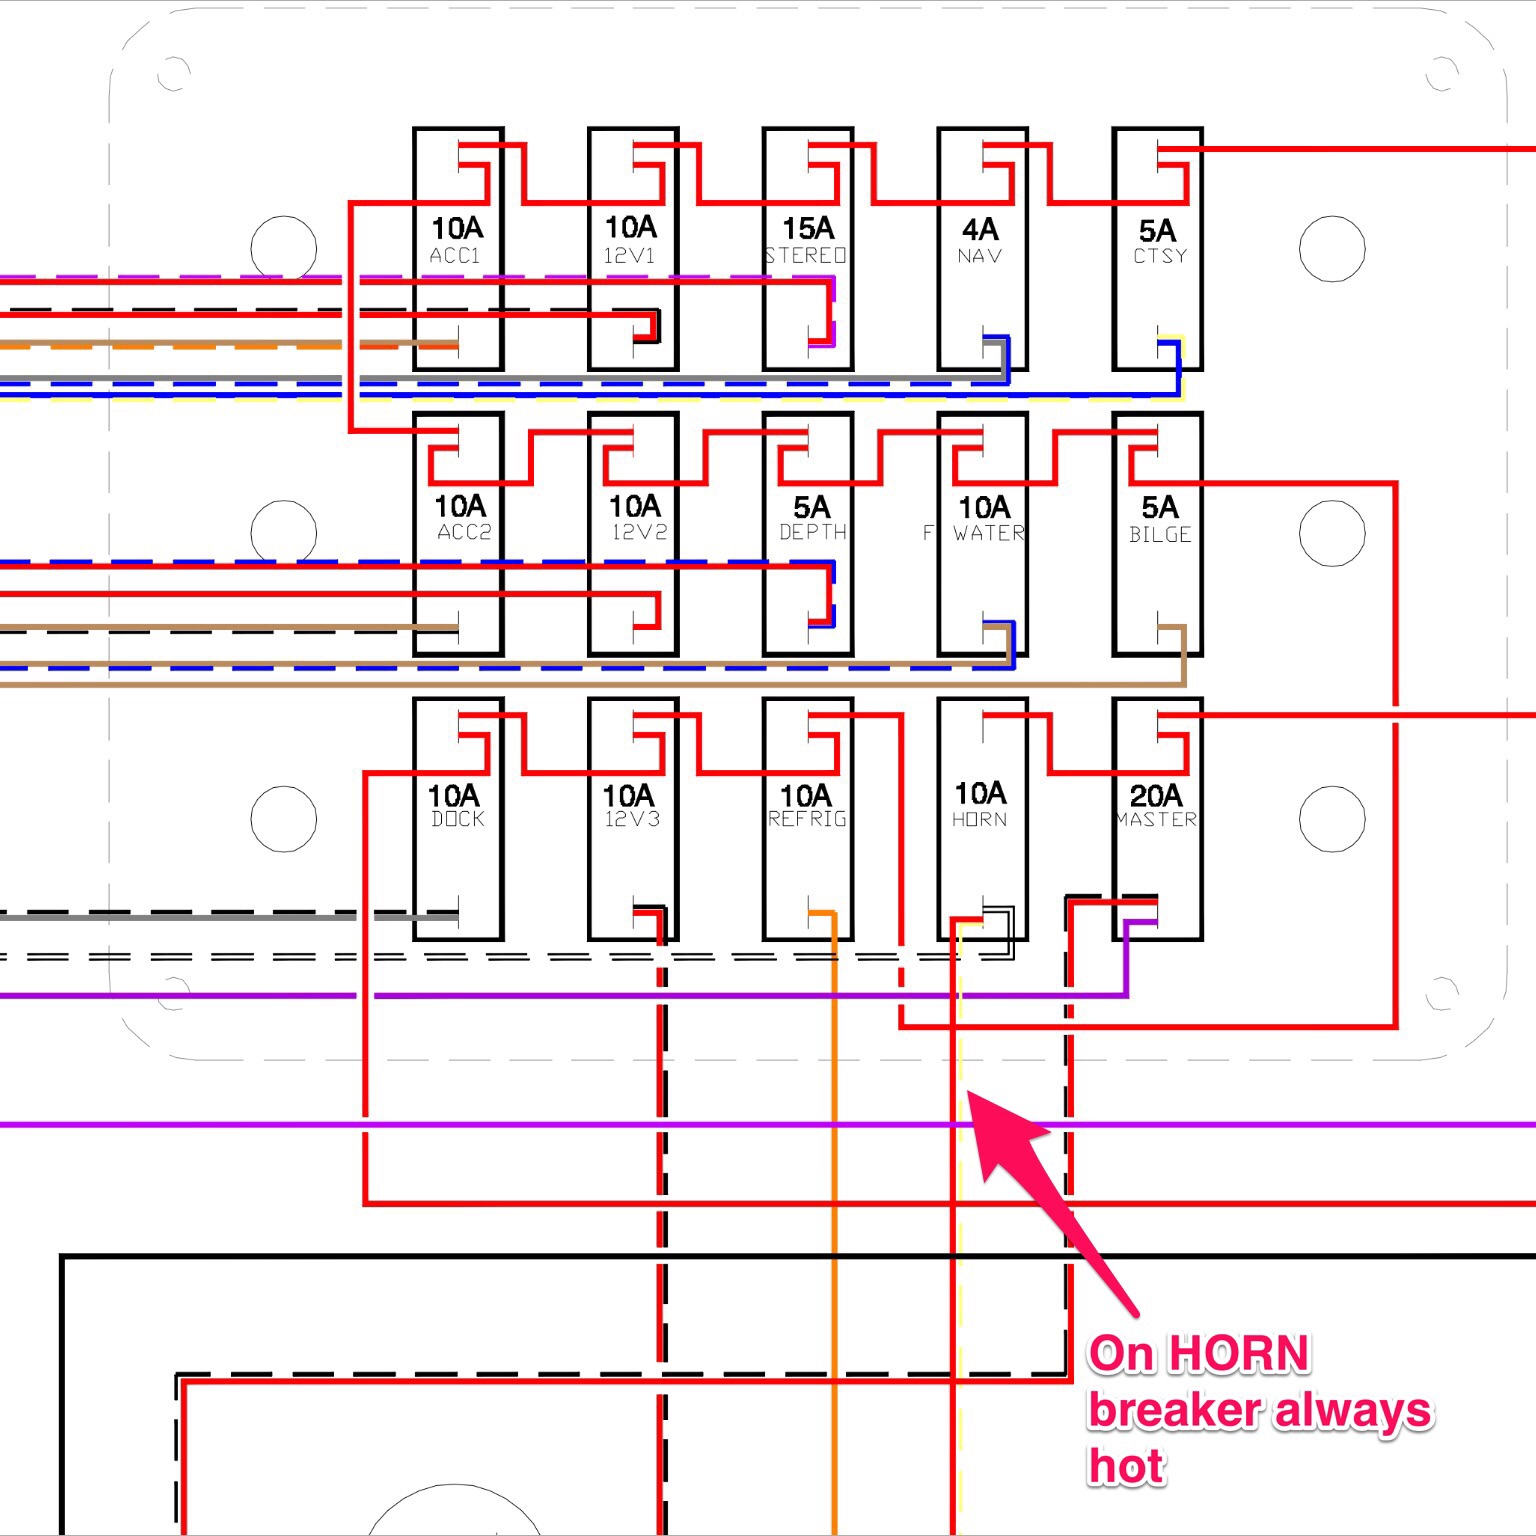 hight resolution of hurricane boat wiring diagram 29 wiring diagram images champion boat wiring diagram pontoon boat wiring diagram